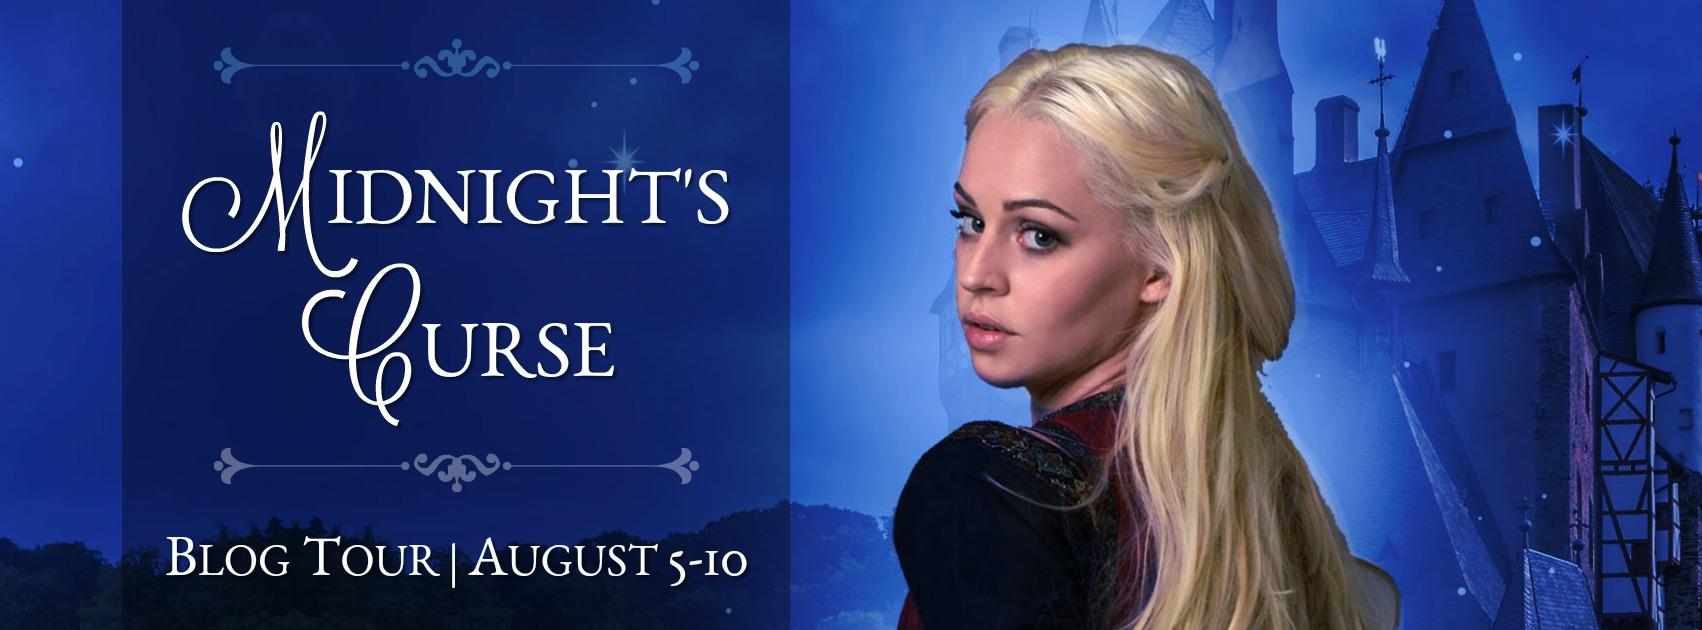 Midnight's Curse Blog Tour Mock-Up